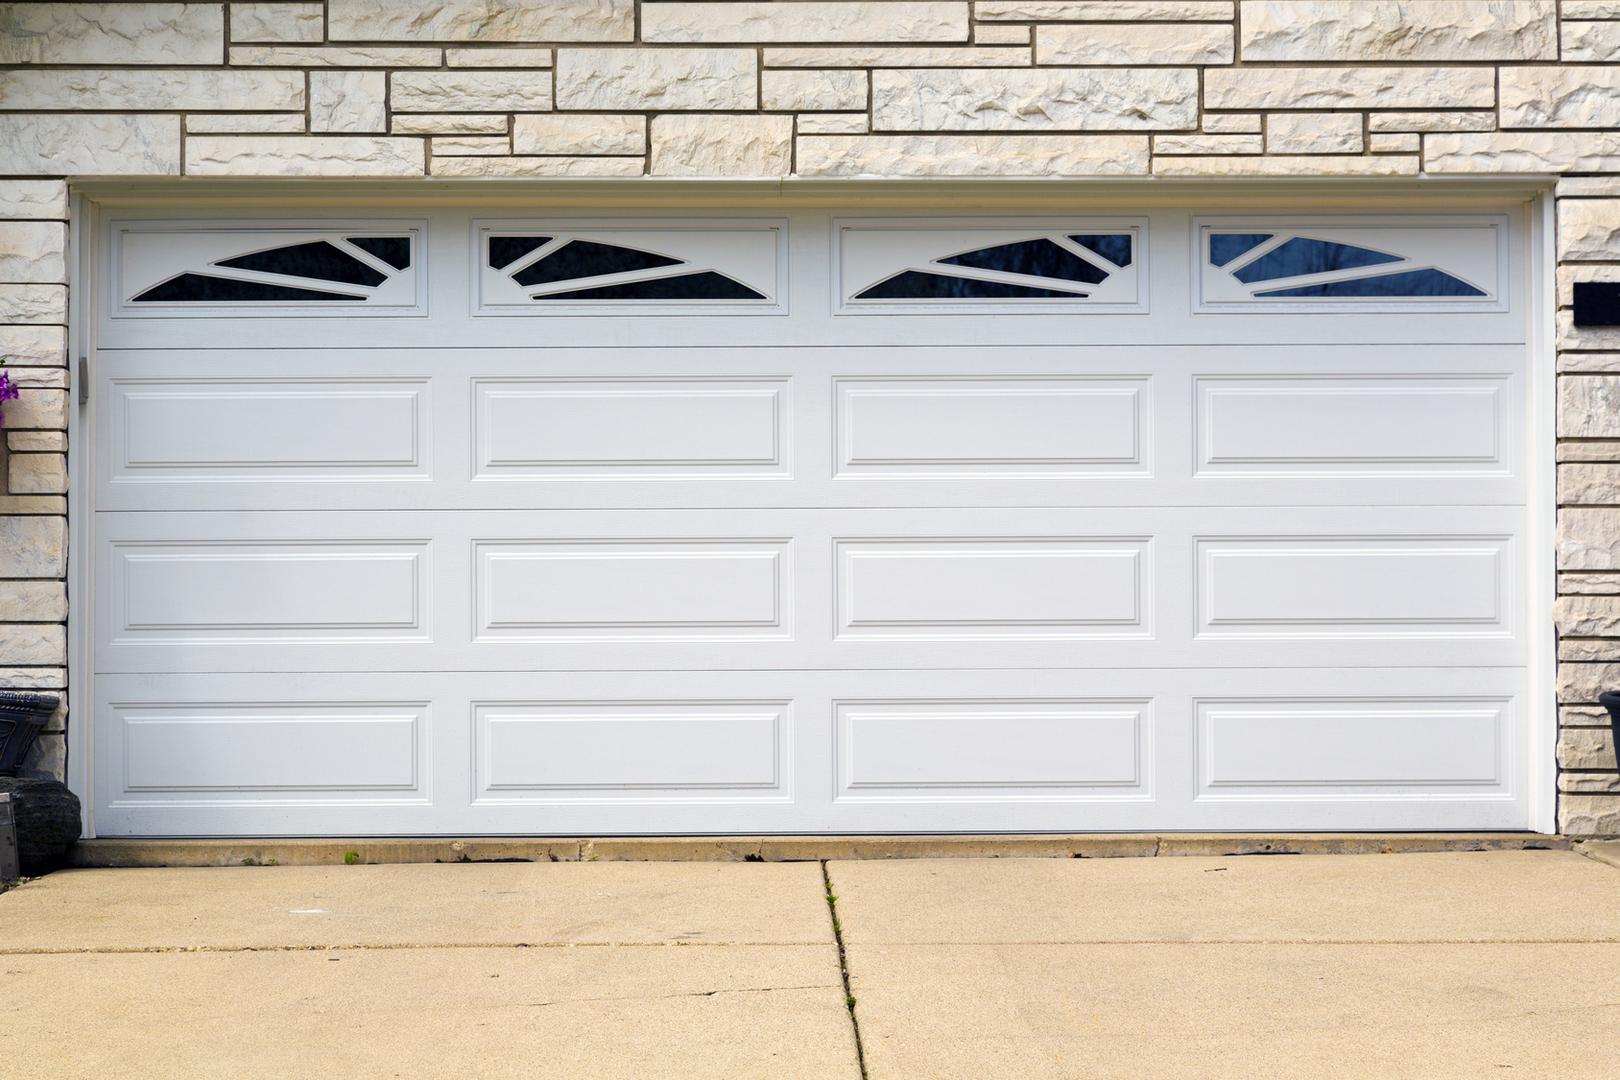 Ez Garage Door Company Pittsburgh - Garage Designs on furnace repair pittsburgh, electrical repair pittsburgh, appliance repair pittsburgh,